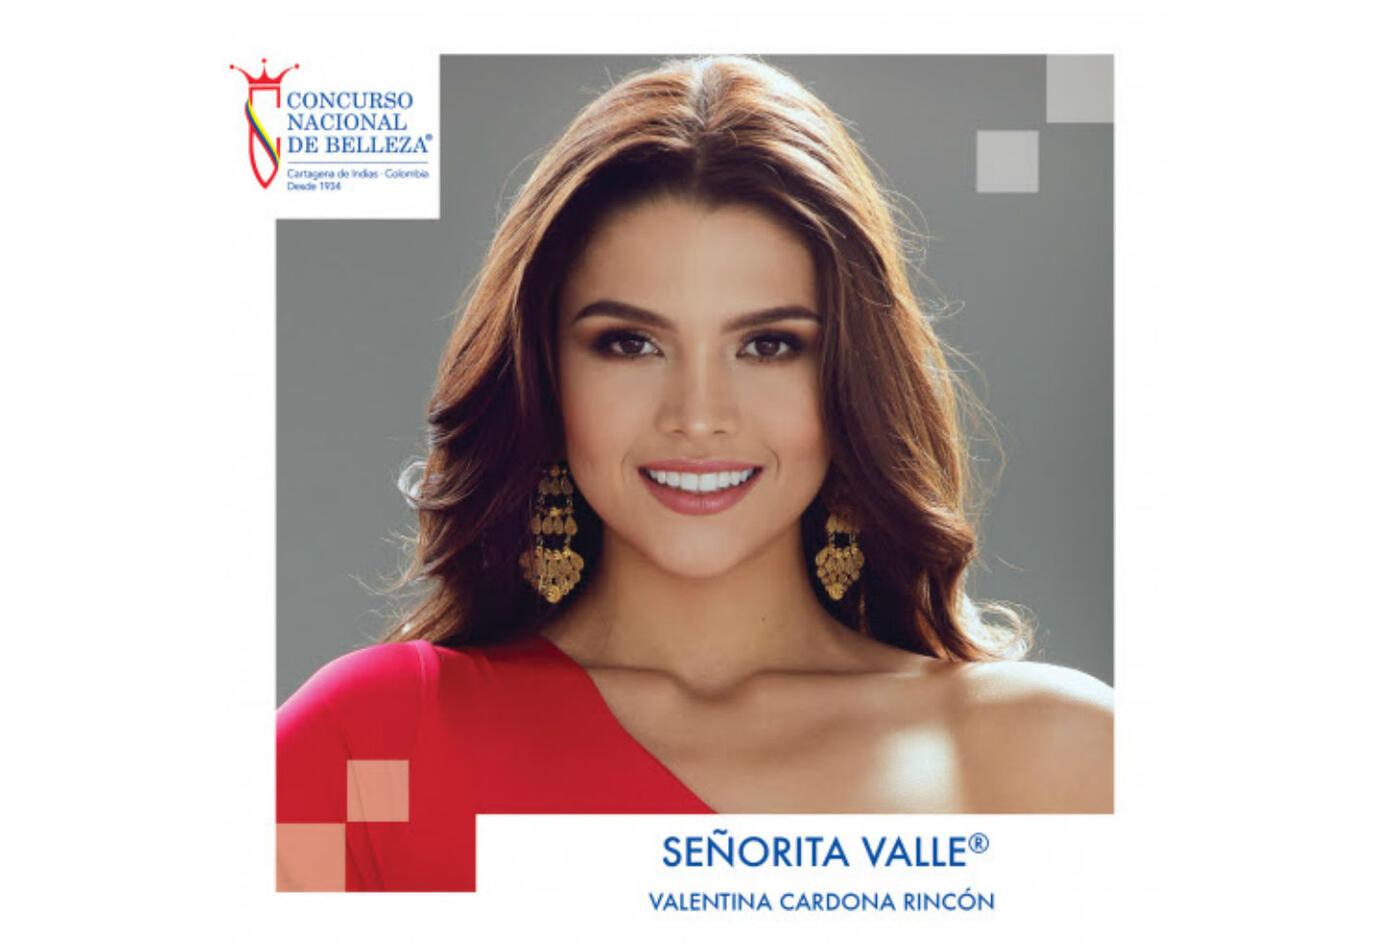 Valentina Cardona, Señorita Valle 2019